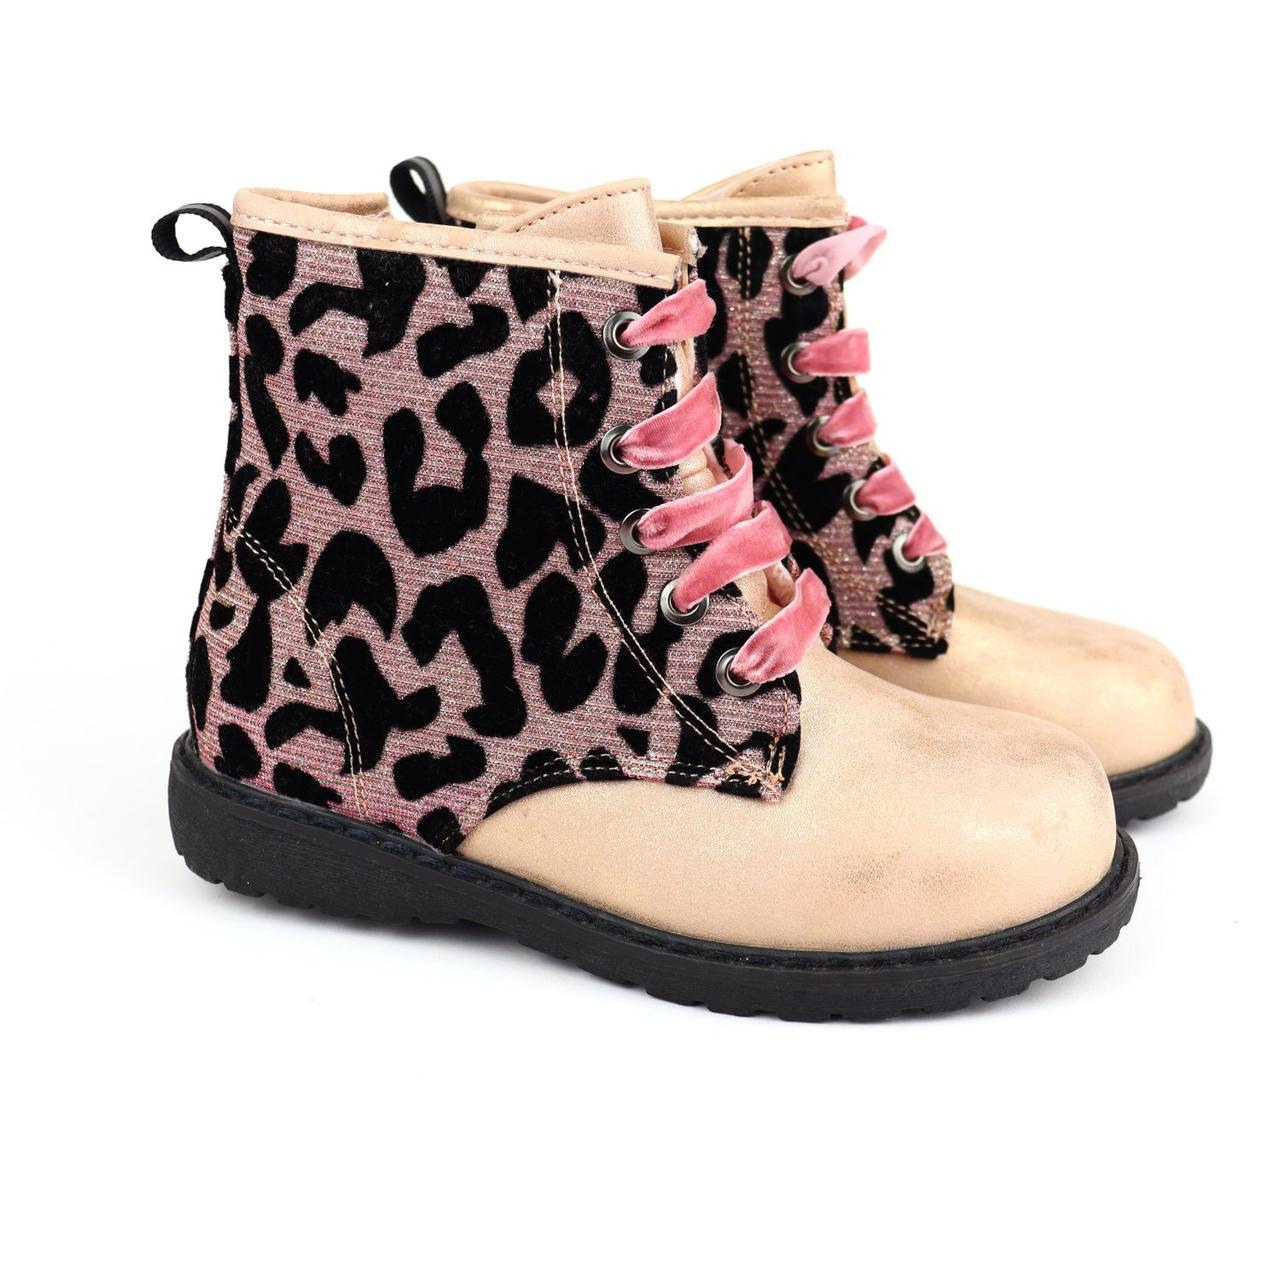 5831A Ботинки демисезонные для девочки леопард тм Том.м размер 25,26,27,28,29,30,31,32